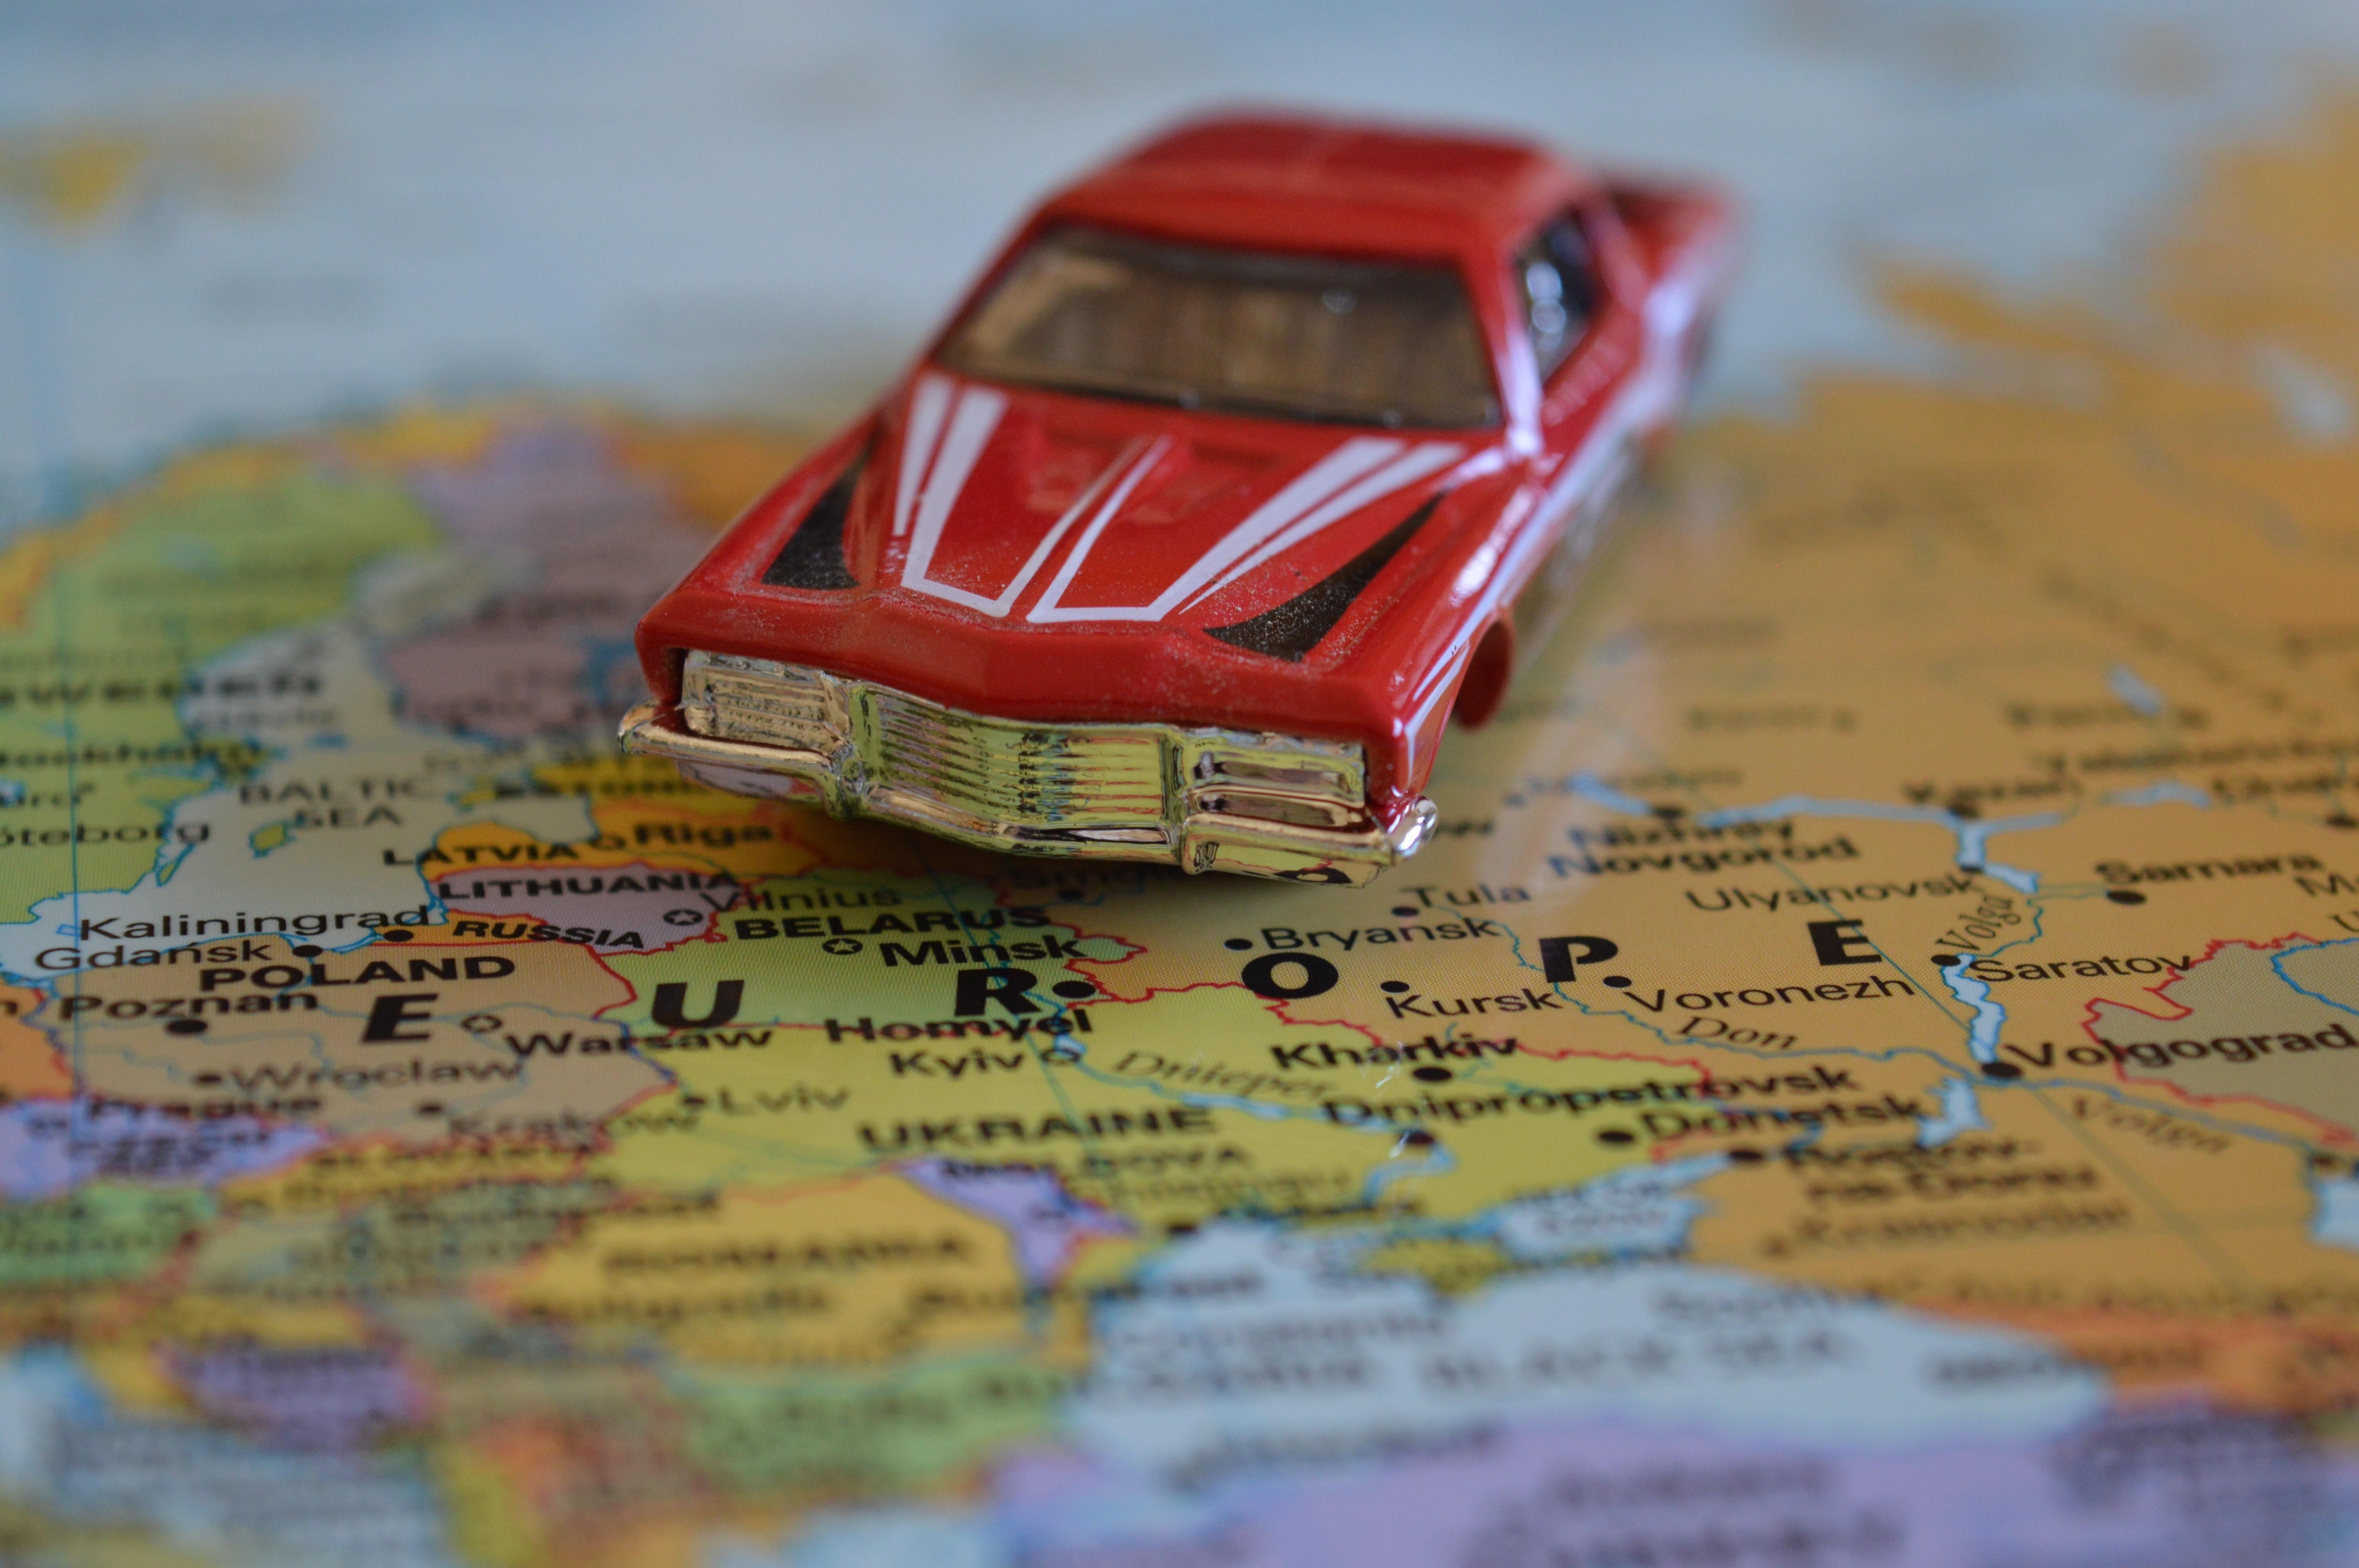 Coche en miniatura sobre un mapa